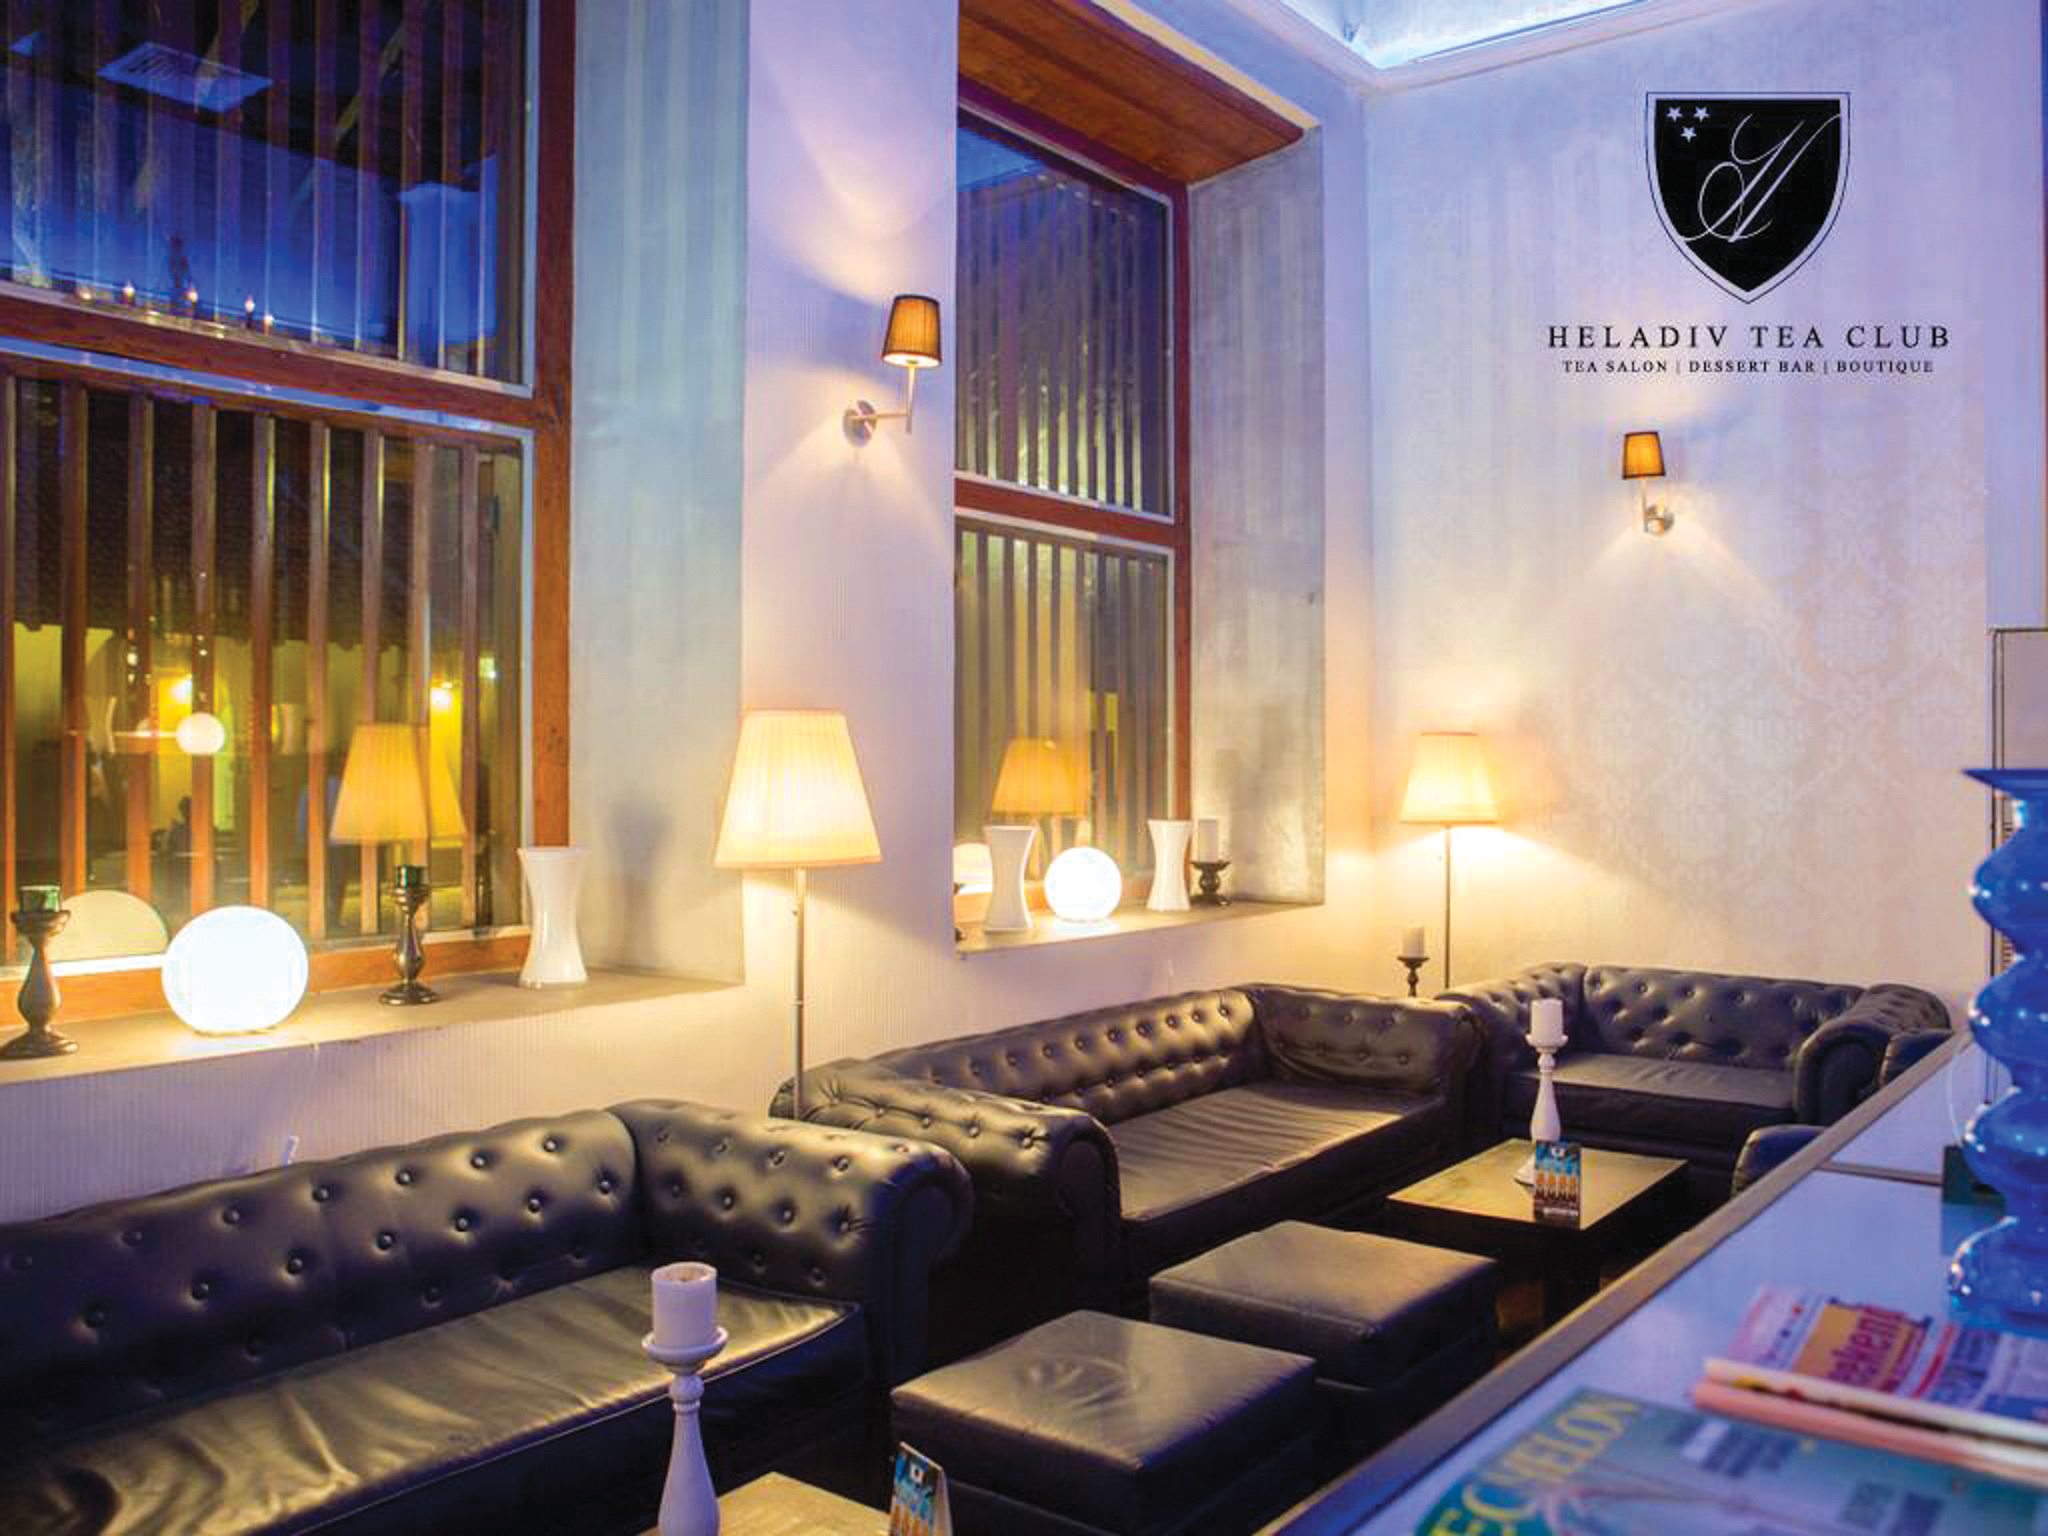 Heladiv Tea Club | Restaurants in Colombo 1, Sri Lanka